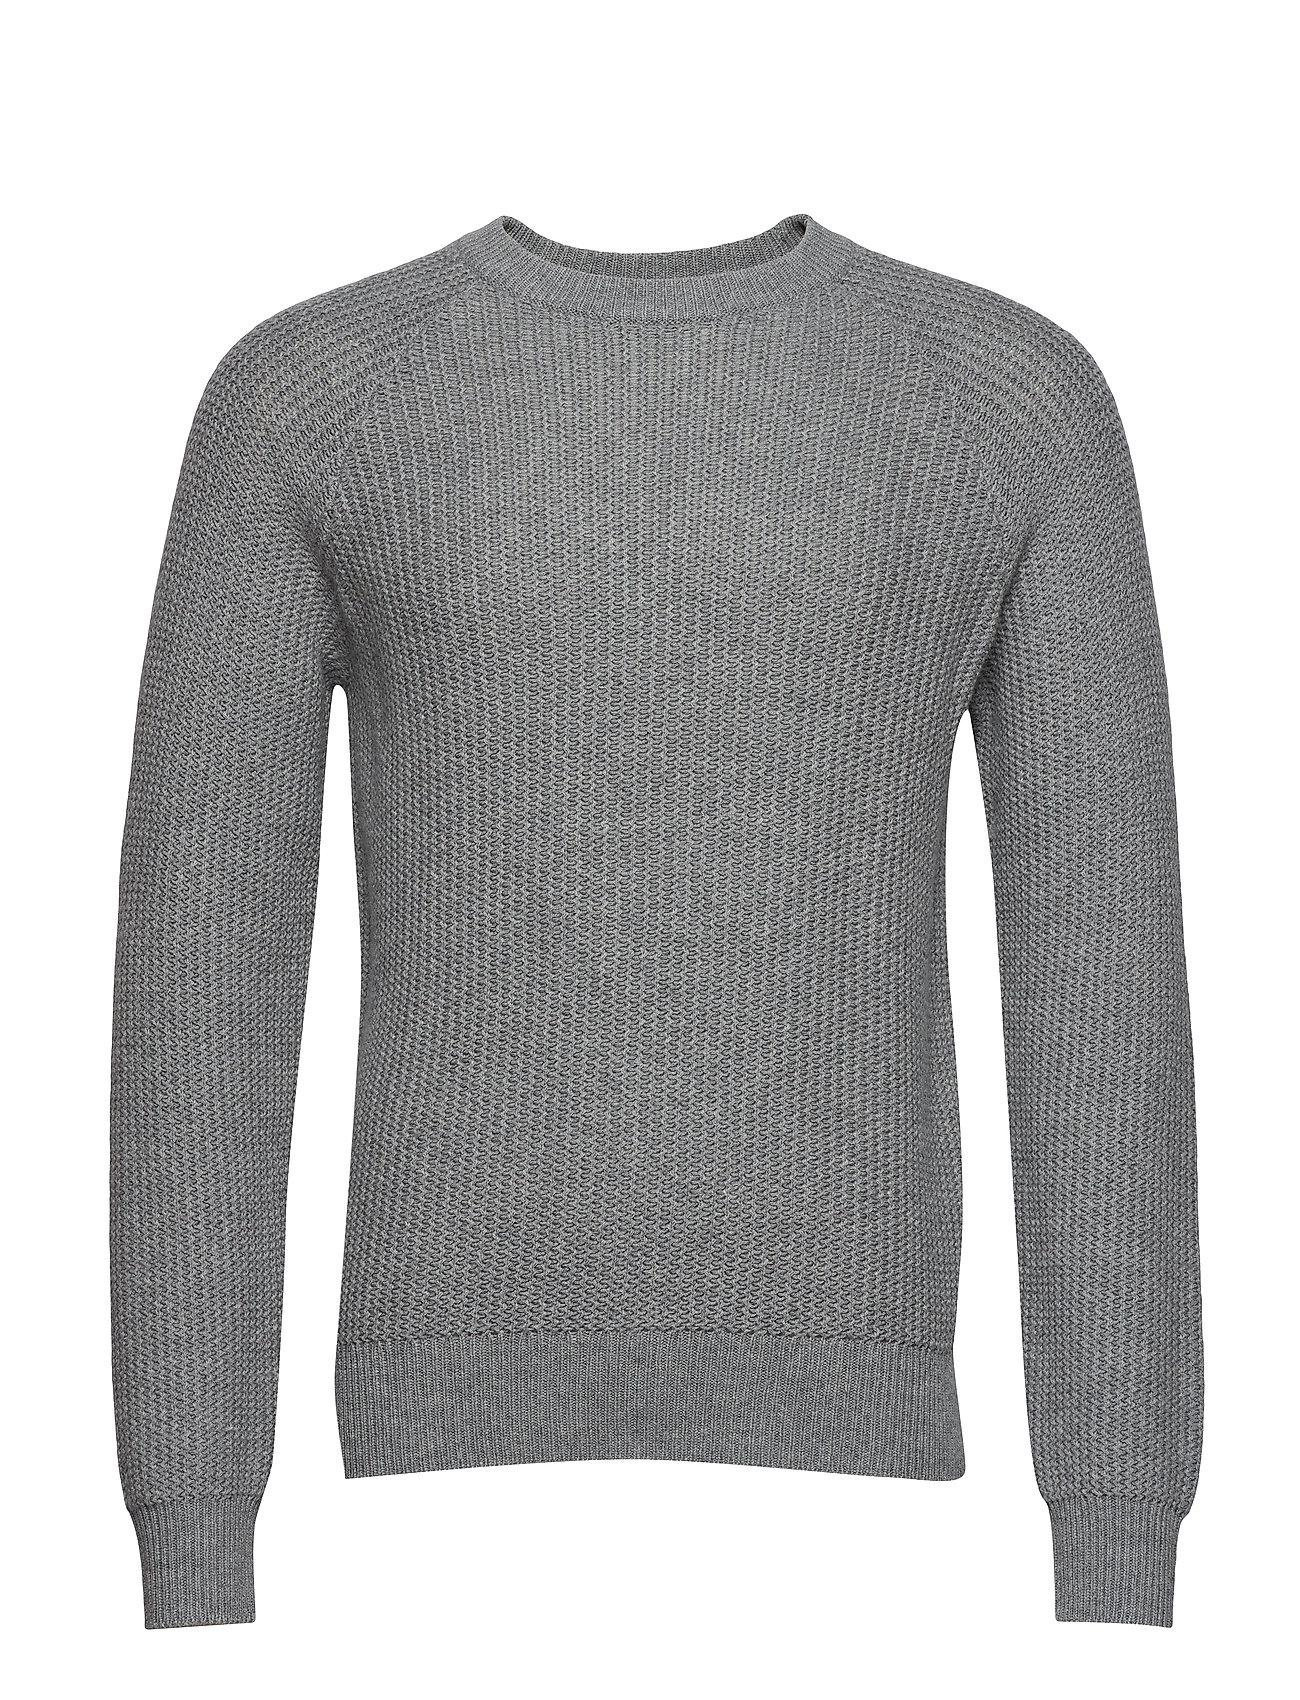 901a7ec64bcc M. Wave Stitch Sweater (Grey Mel.) (£131.60) - Filippa K -